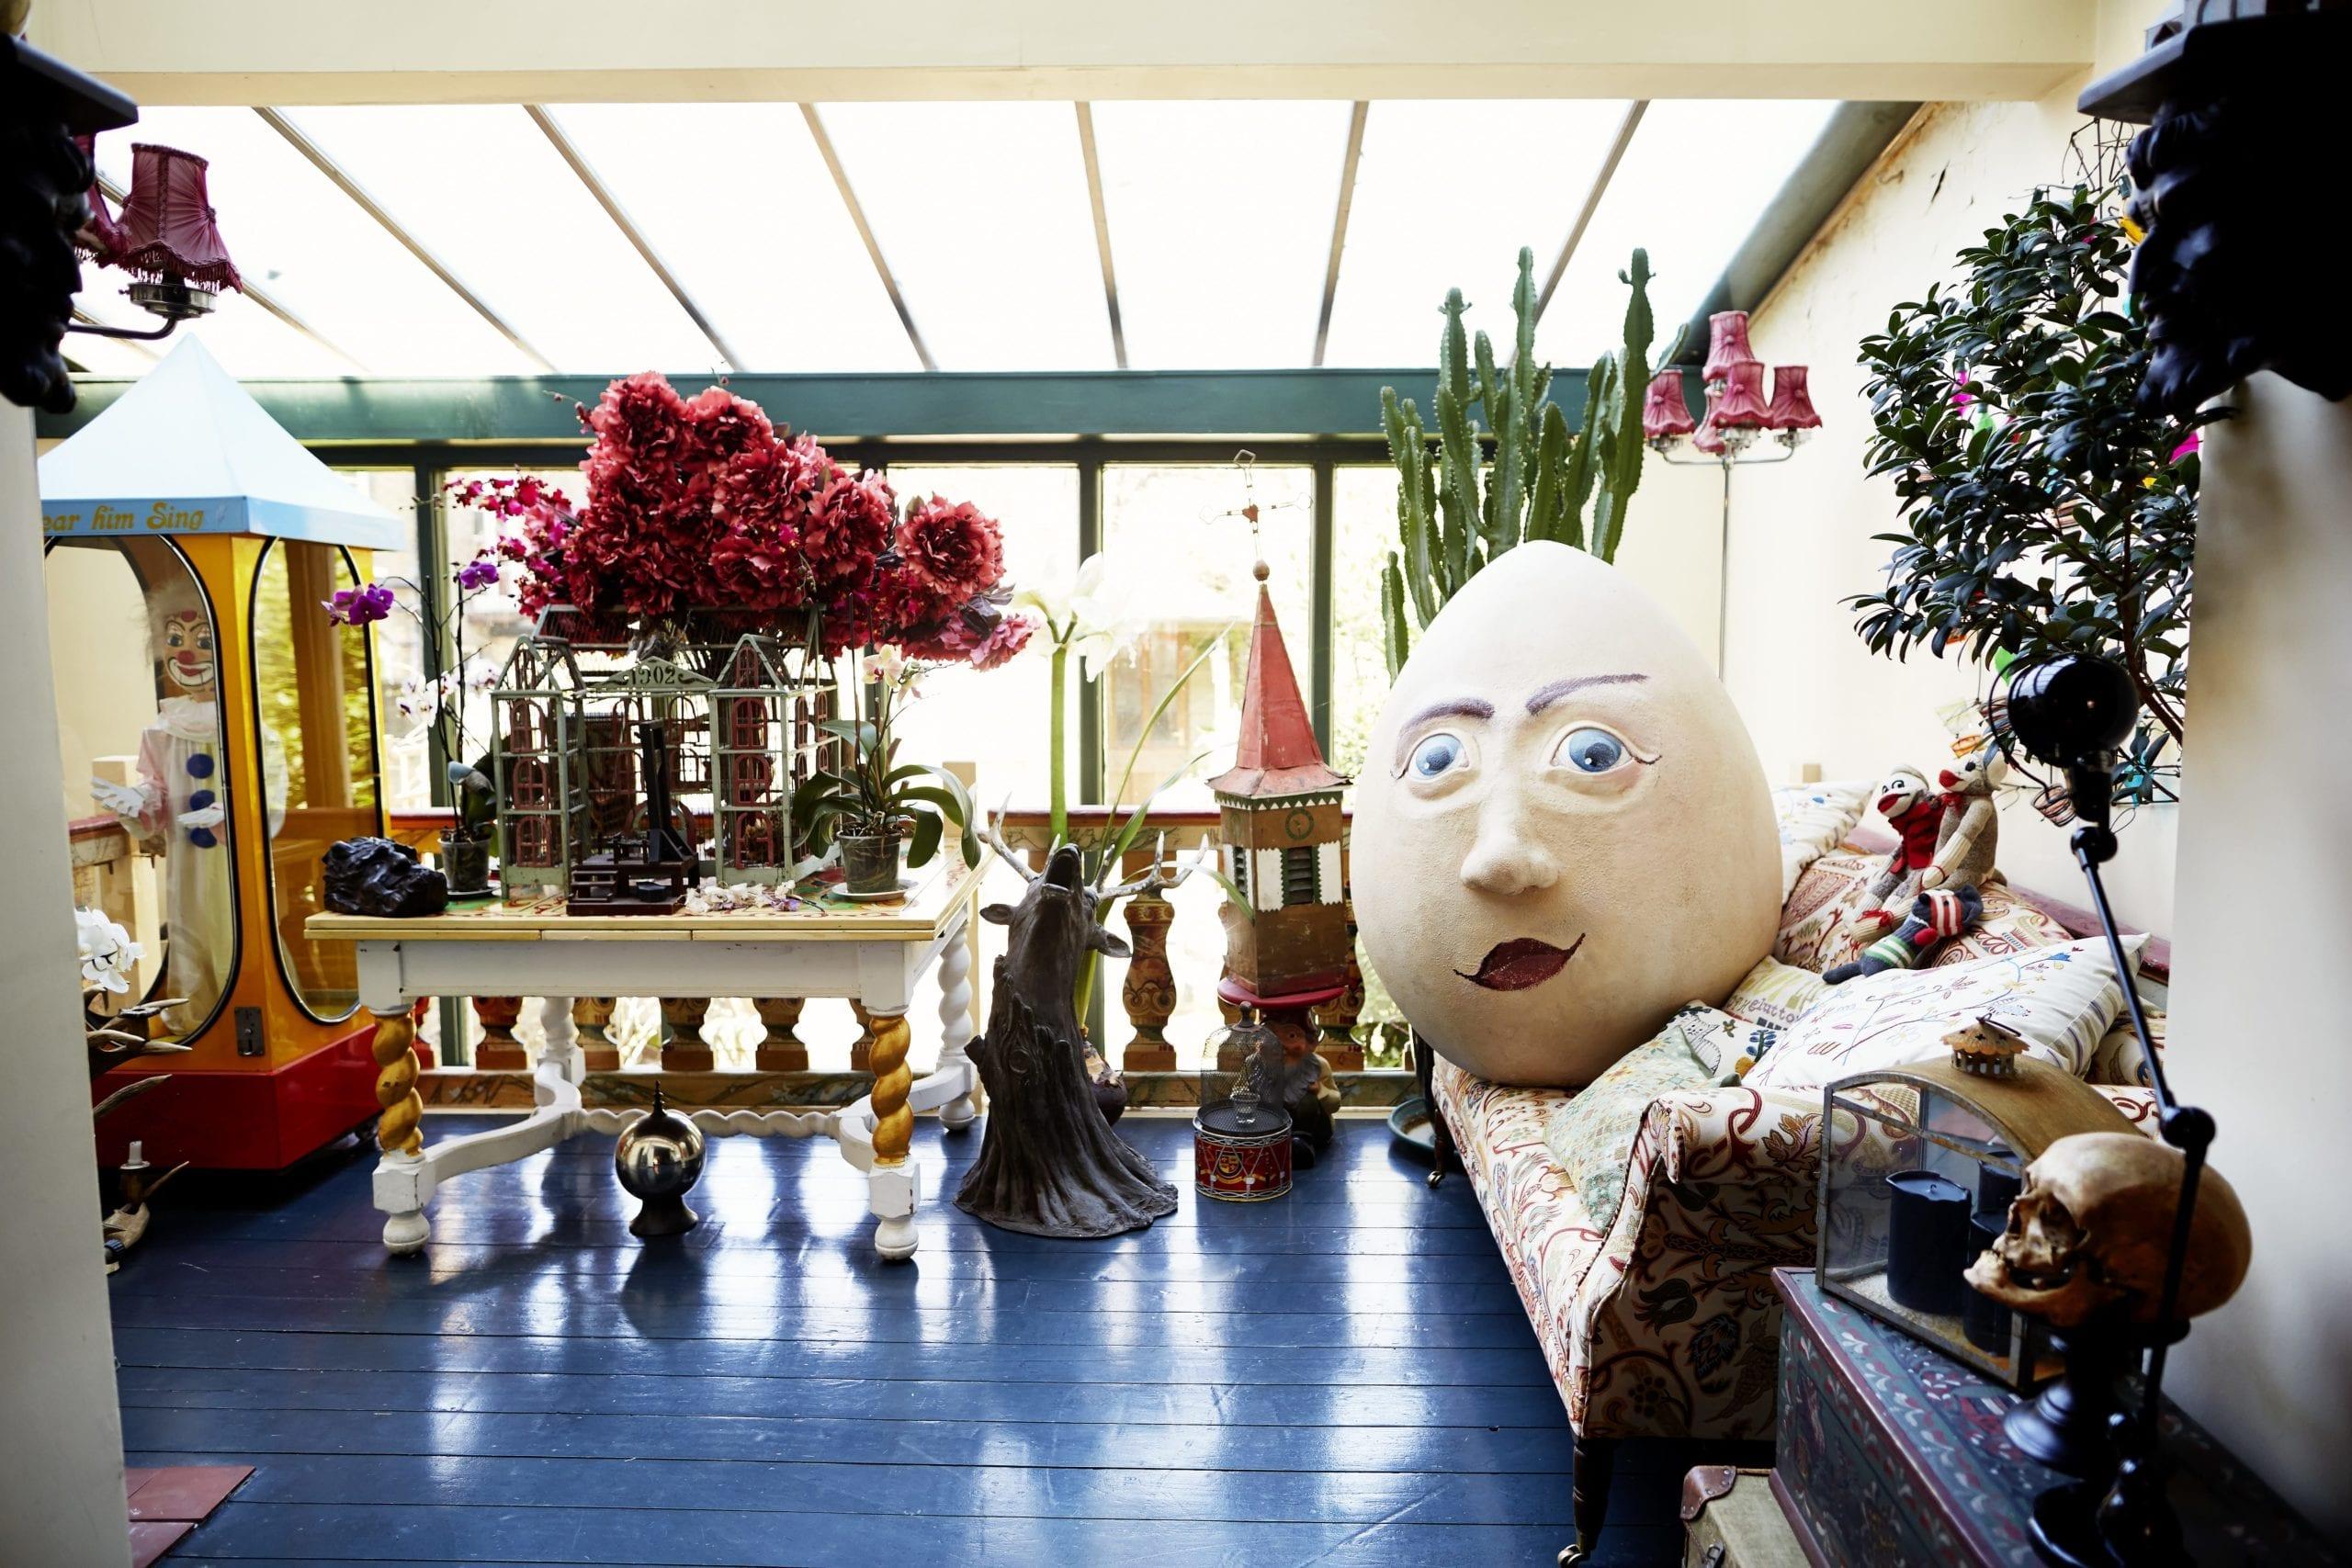 The London home of art director Simon Costin